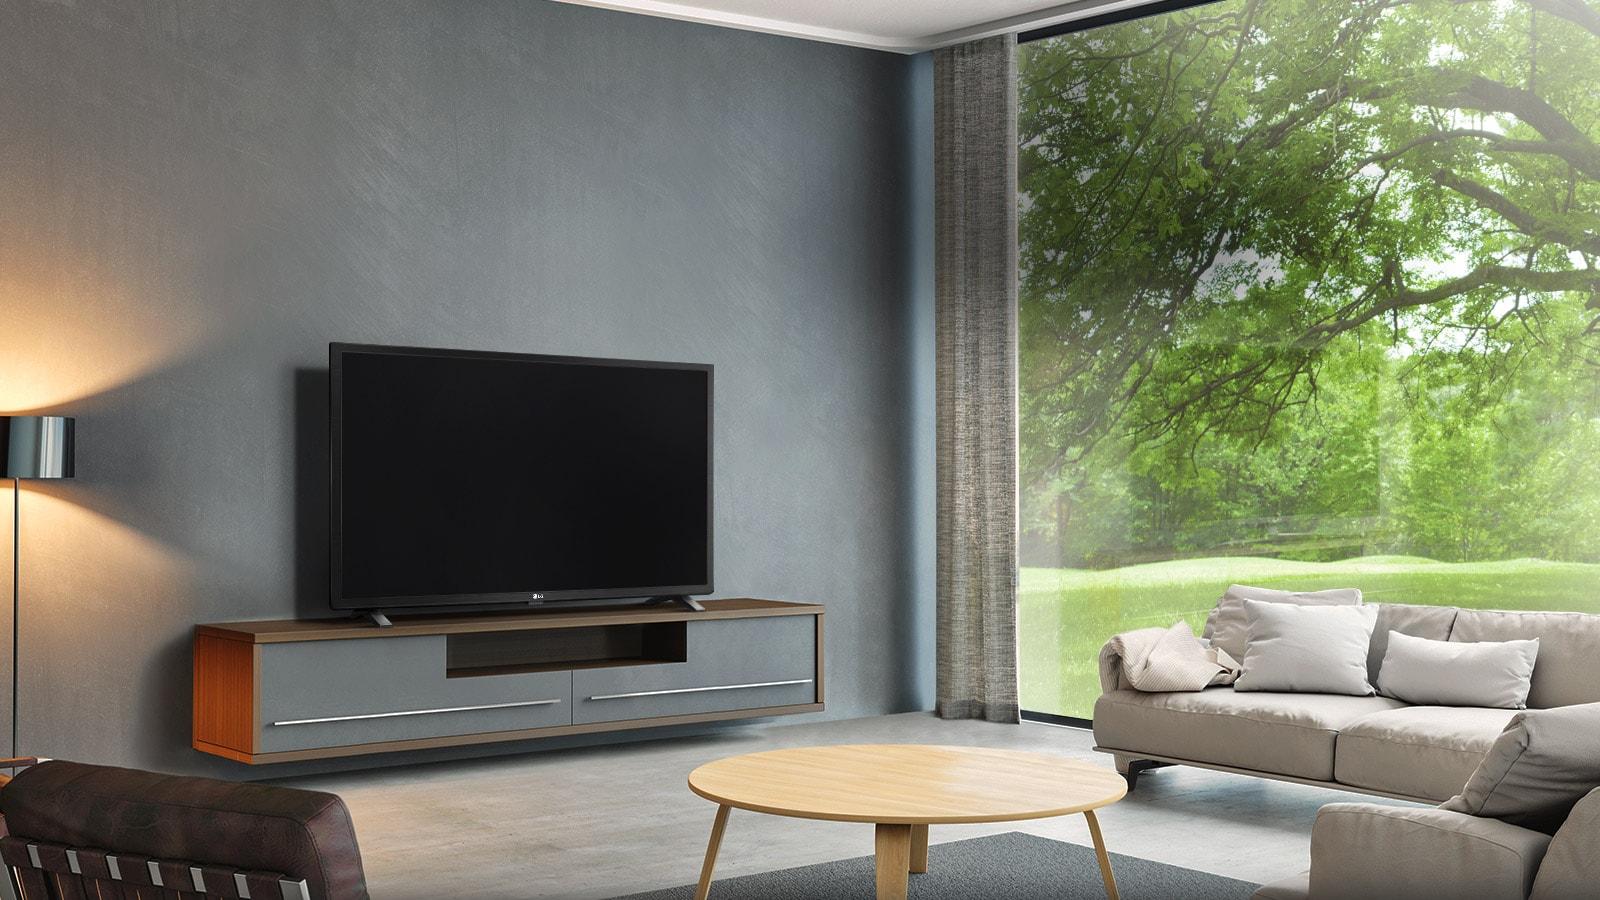 TV-FHD-43-LM55-04-Design-Desktop